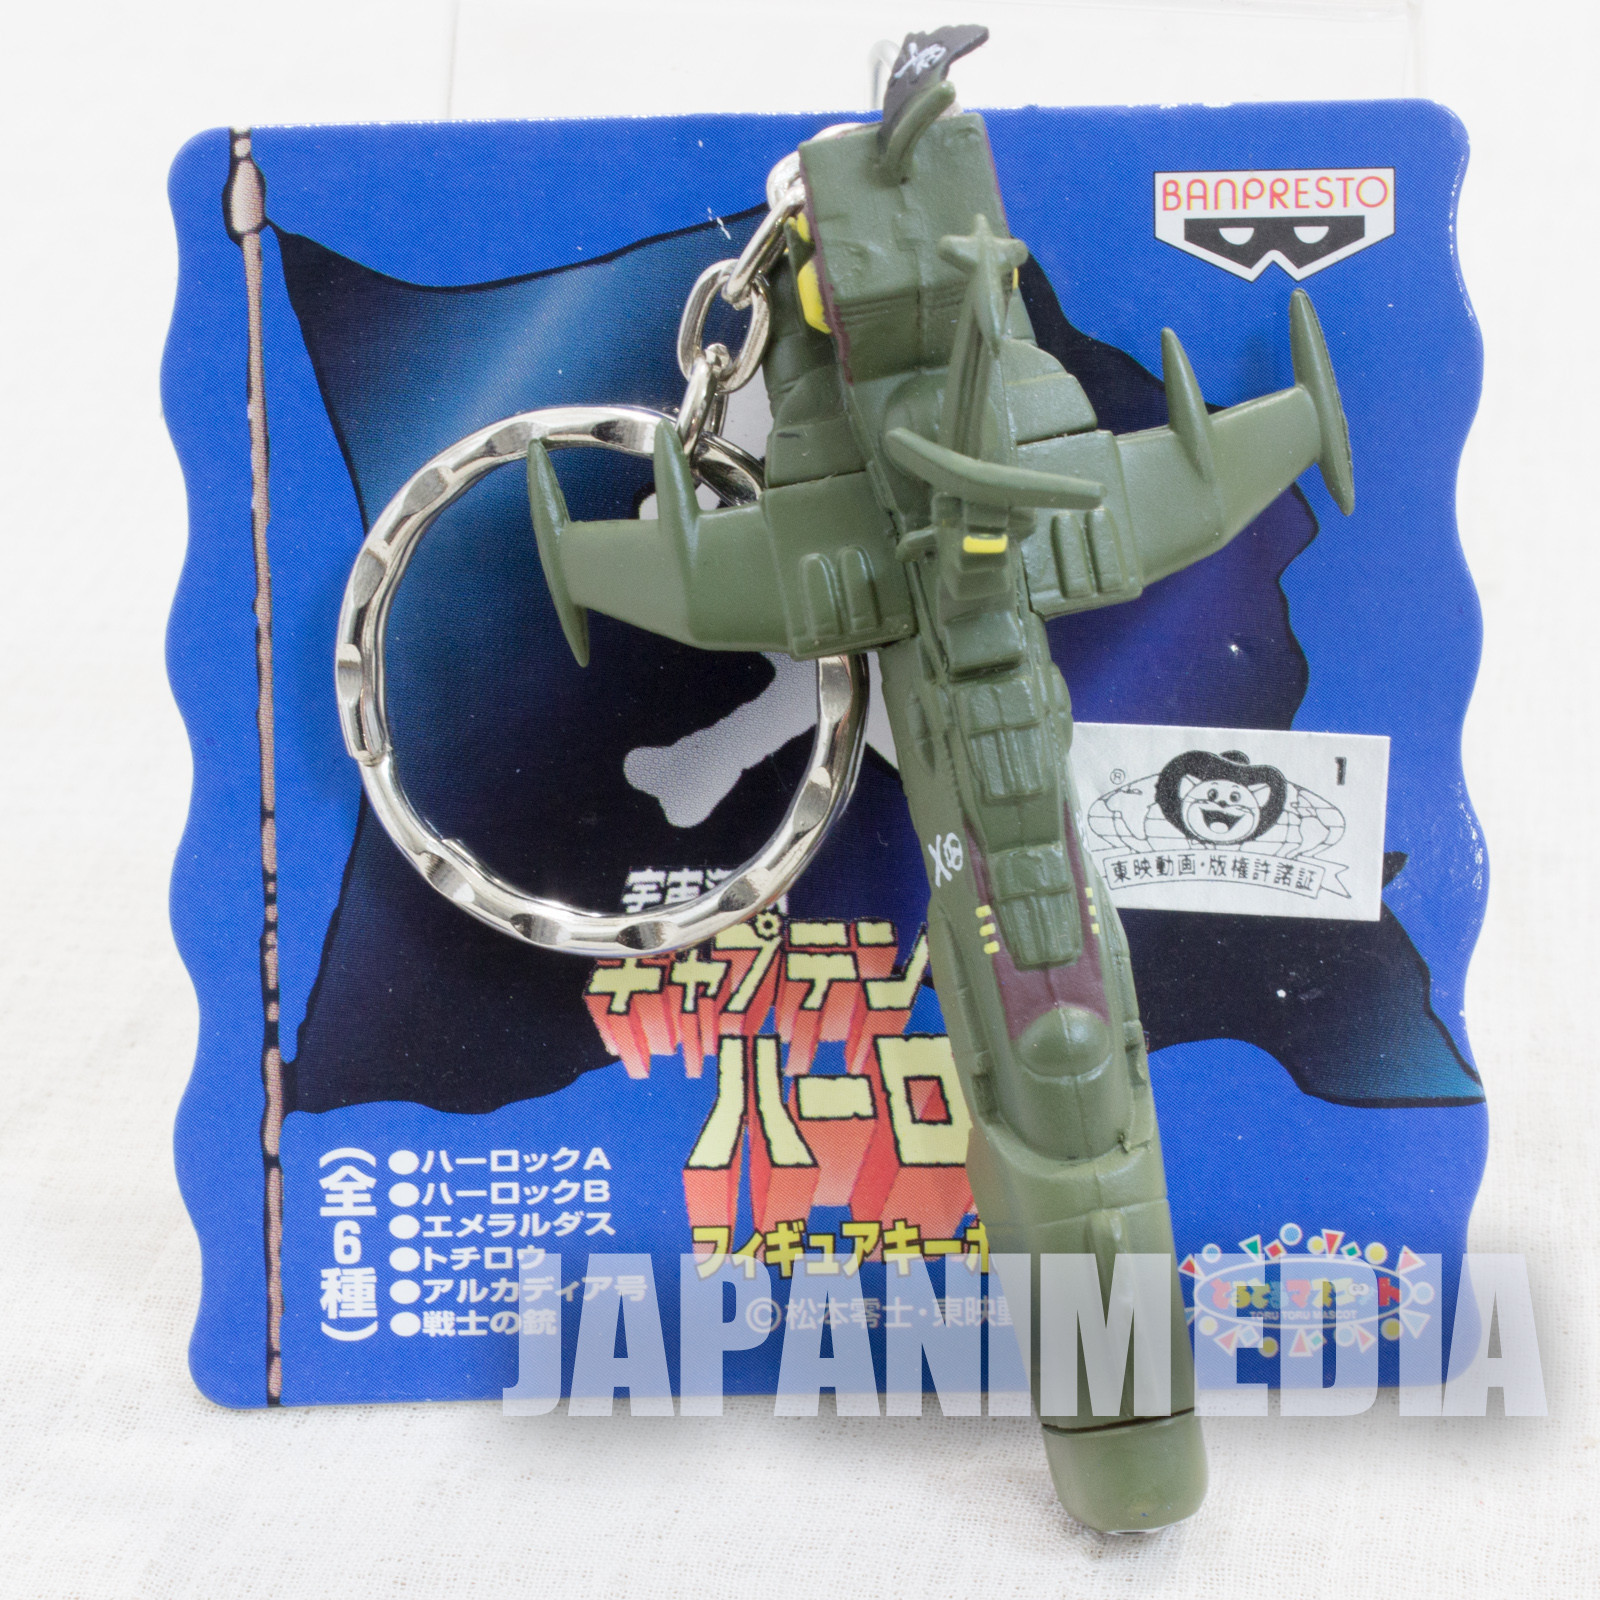 Space Pirate Captain Harlock Spaceship Arcadia Figure Key Chain JAPAN ANIME